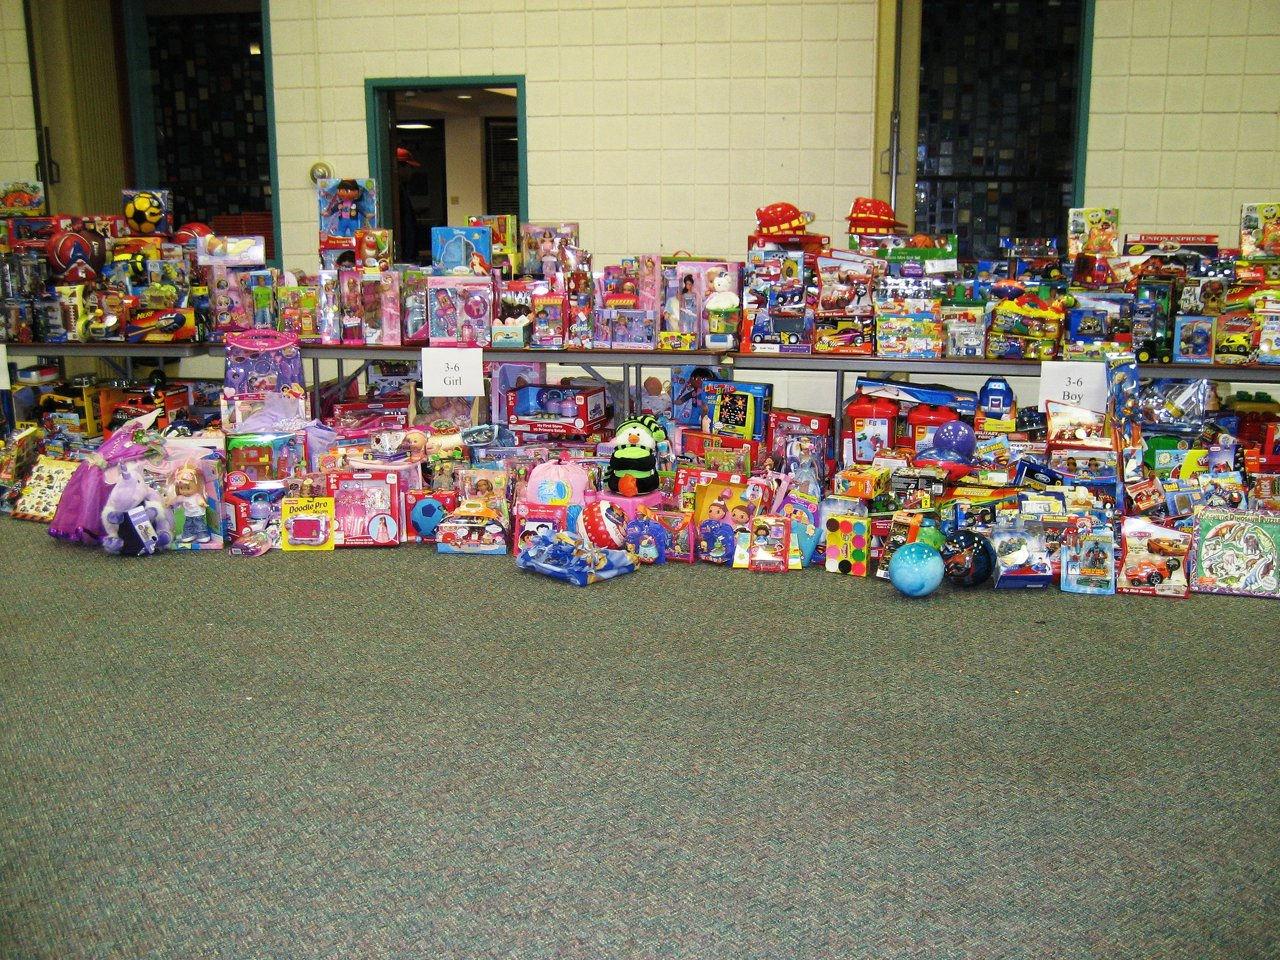 Toys For Girls Age 6 : Wartburg holiday shoppe wix